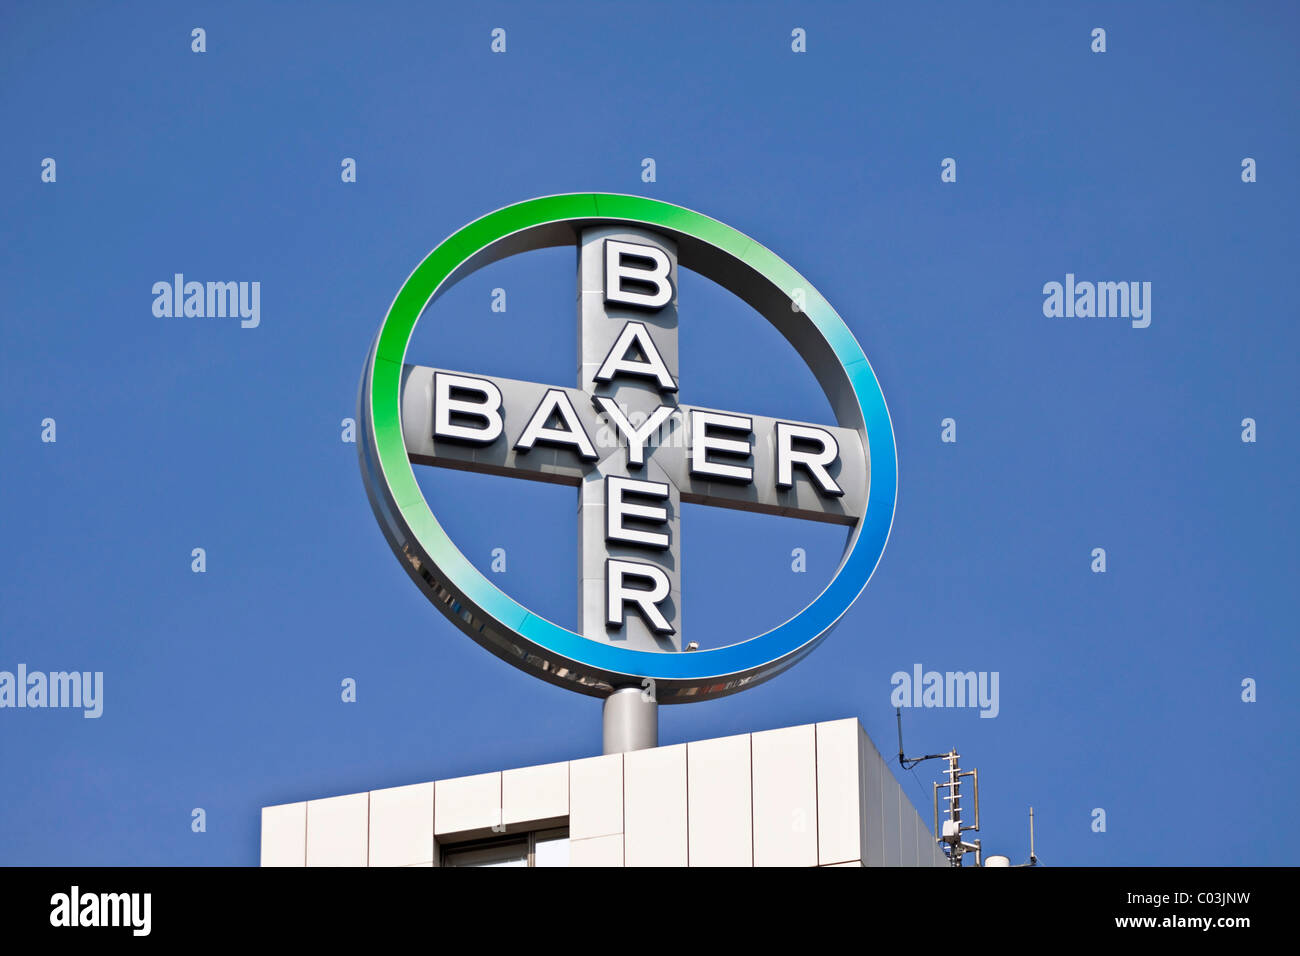 Bayer Stock Photos Bayer Stock Images Alamy